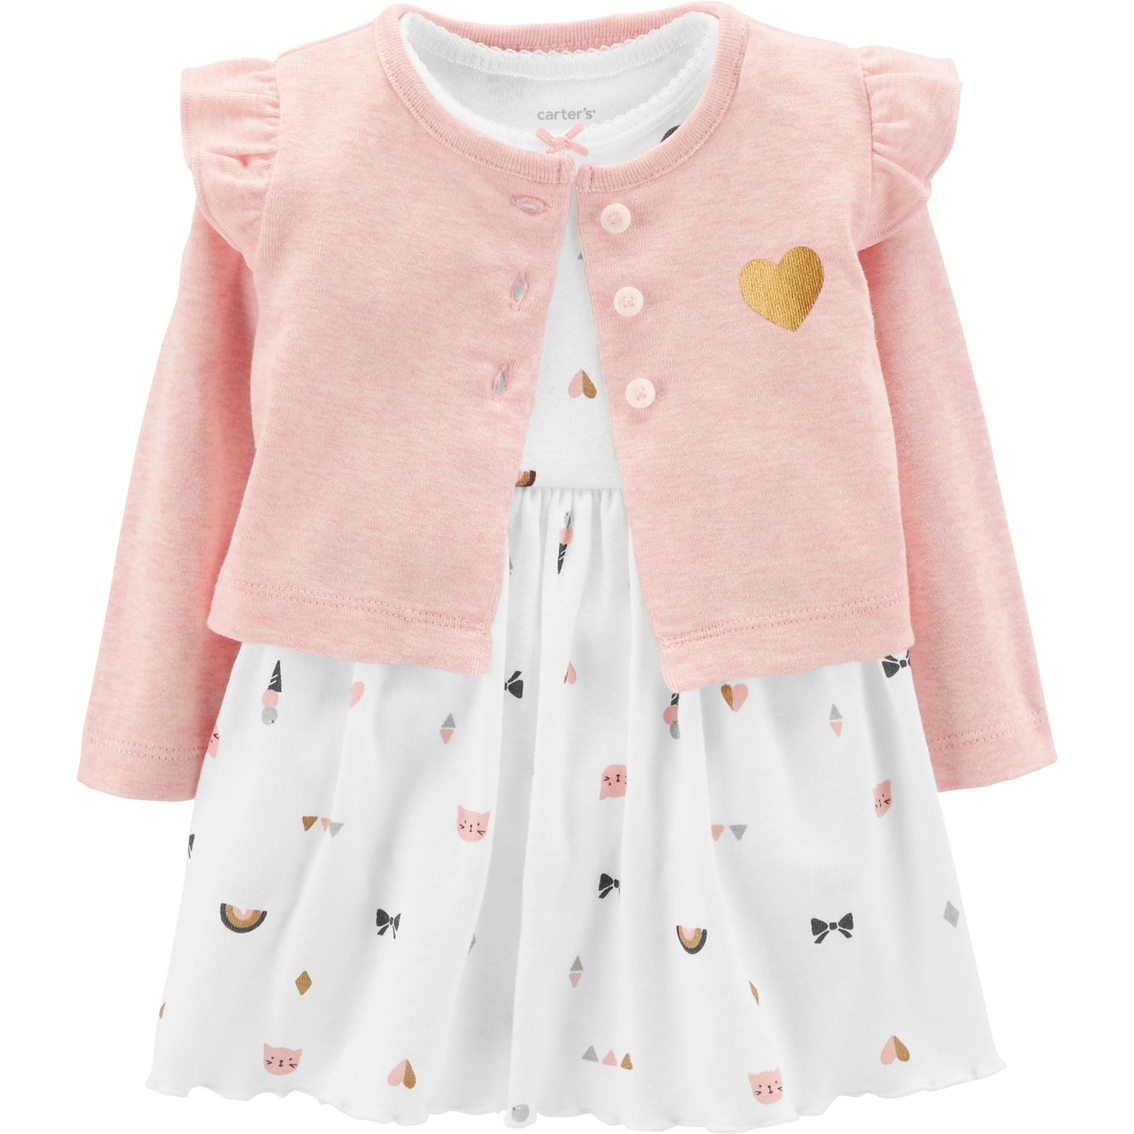 6206e2d4b Carter s Infant Girls 2 Pc. Bodysuit Dress   Cardigan Set